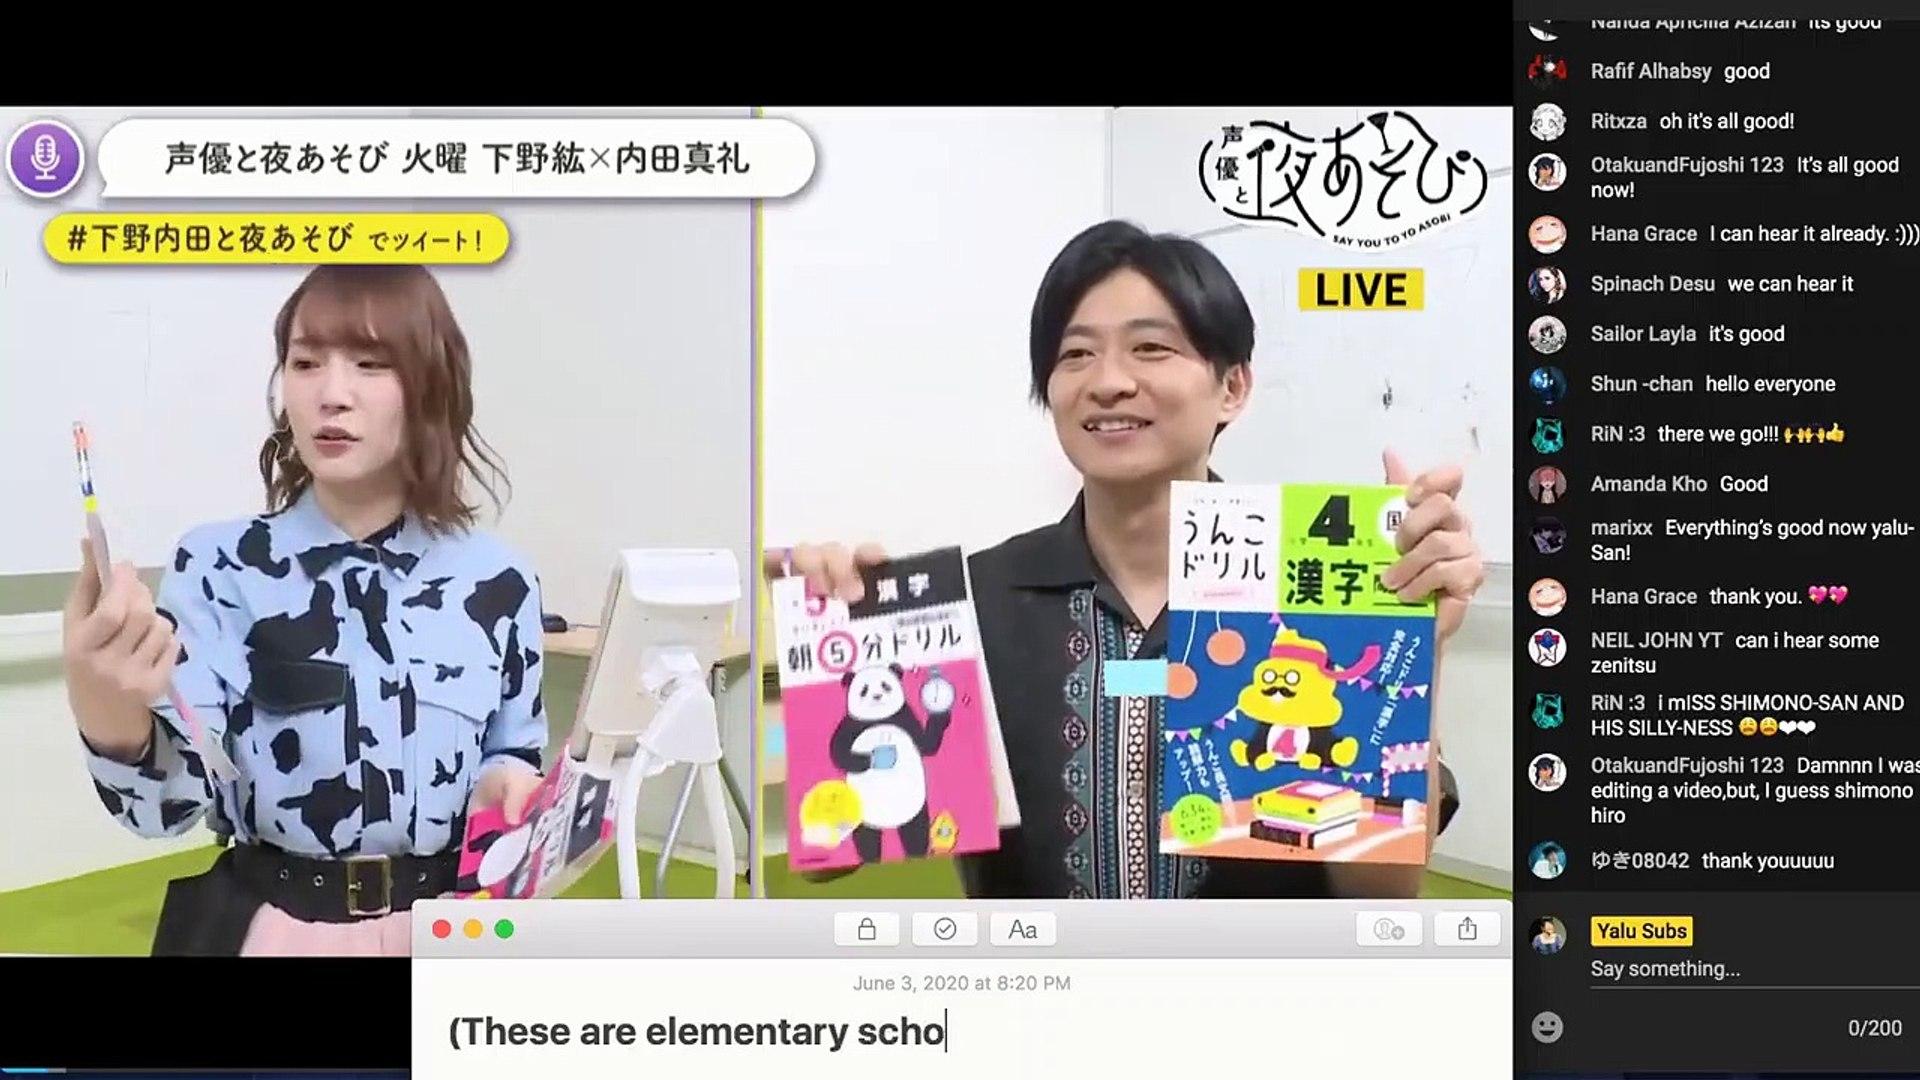 [Shimono Hiro x Uchida Maaya] Yoasobi ep 4 live translate part 1